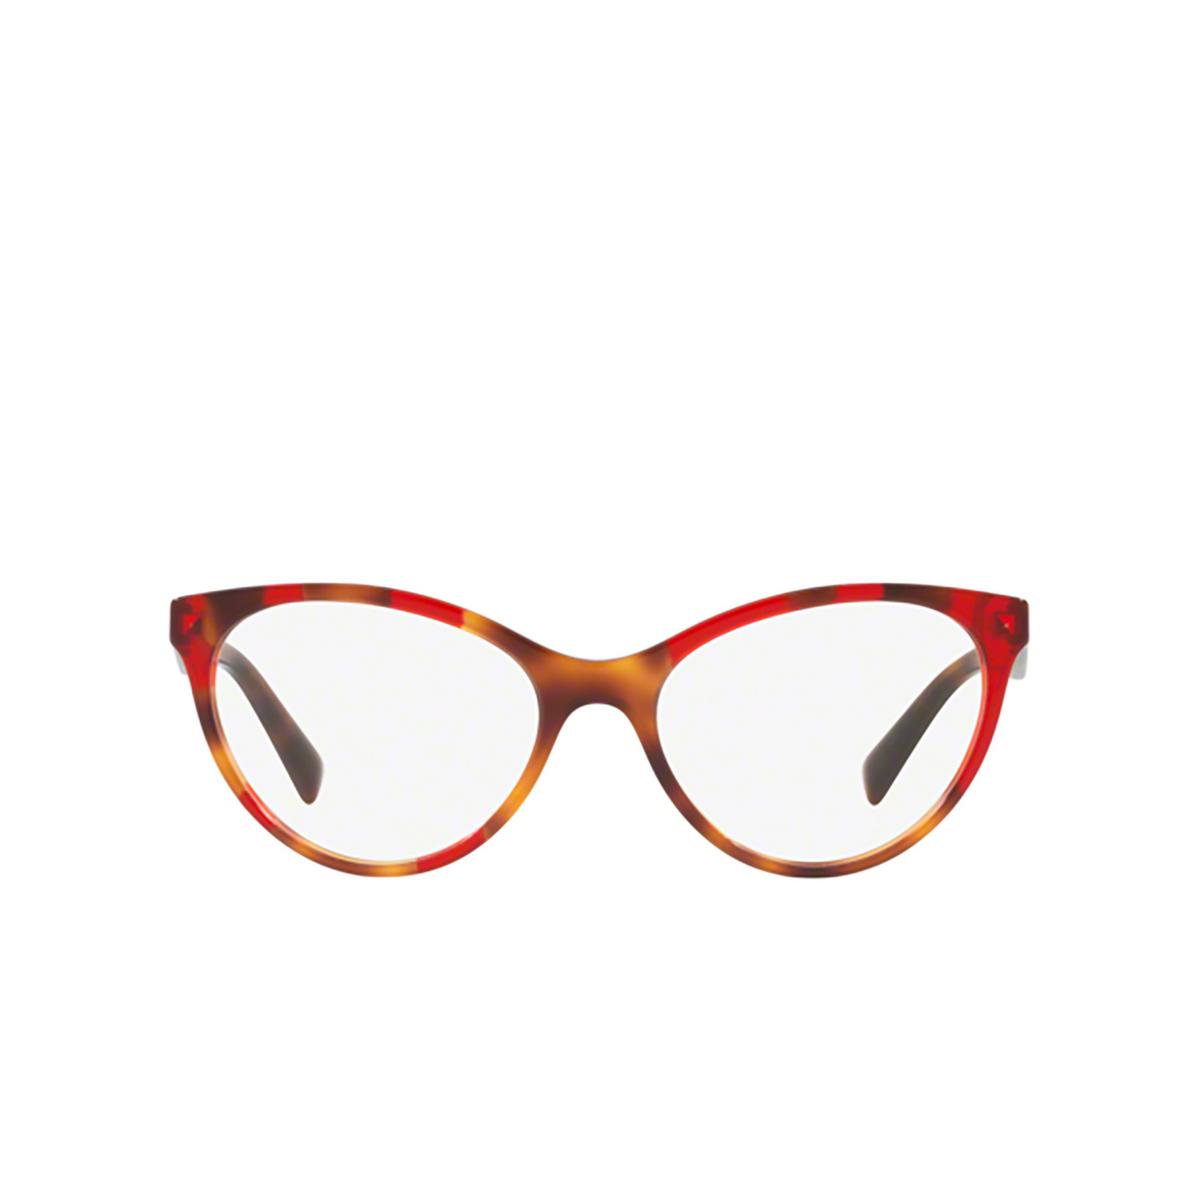 Valentino® Cat-eye Eyeglasses: VA3013 color Havana Inserts Opal Red 5058 - front view.